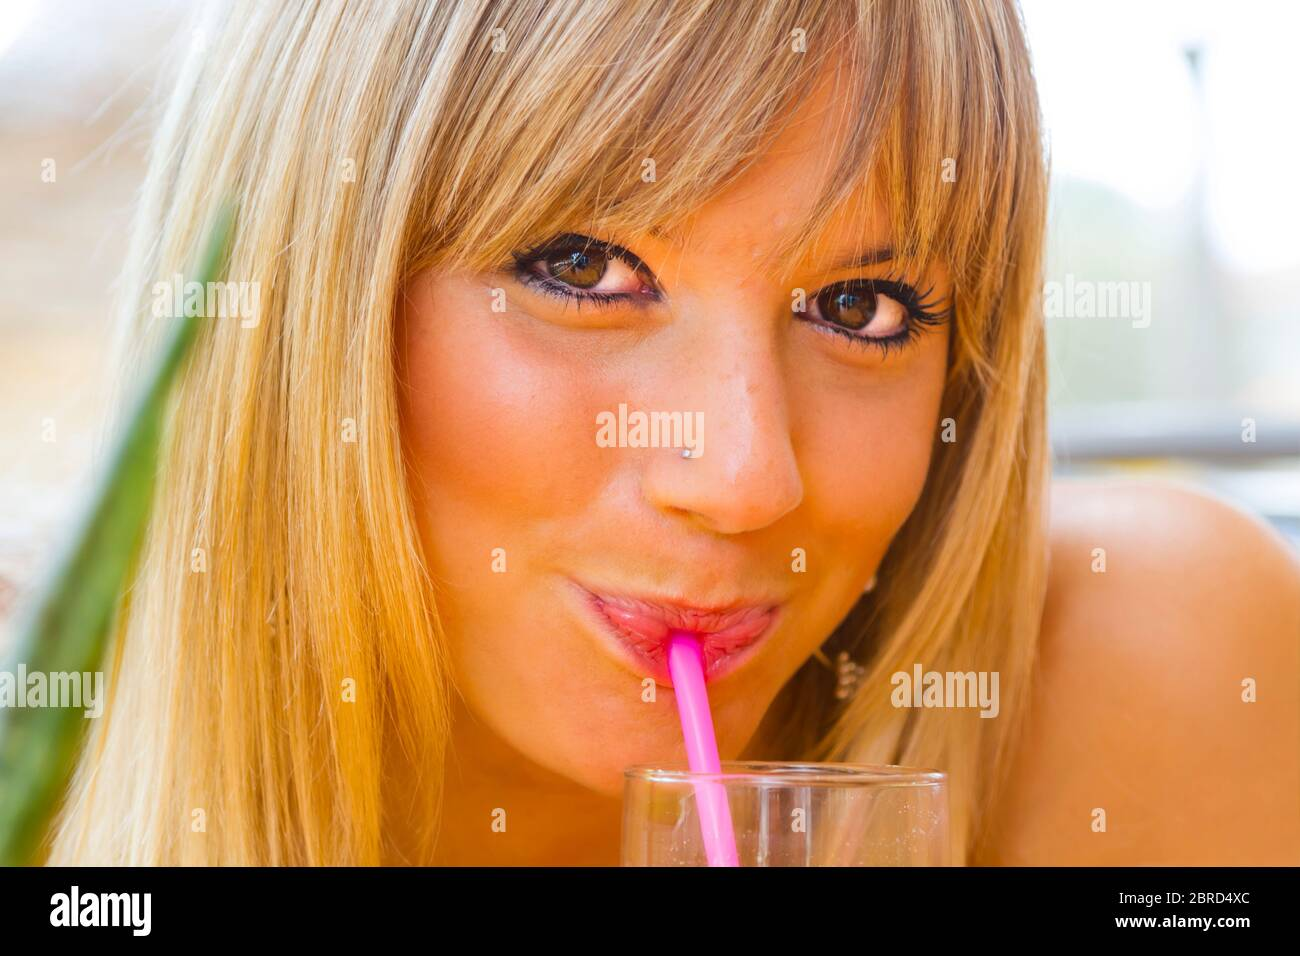 Cute blonde teengirl headshot eyeshot drinking sucking suck juice though using use plastic Pink straw in bar beachbar slight smile Stock Photo